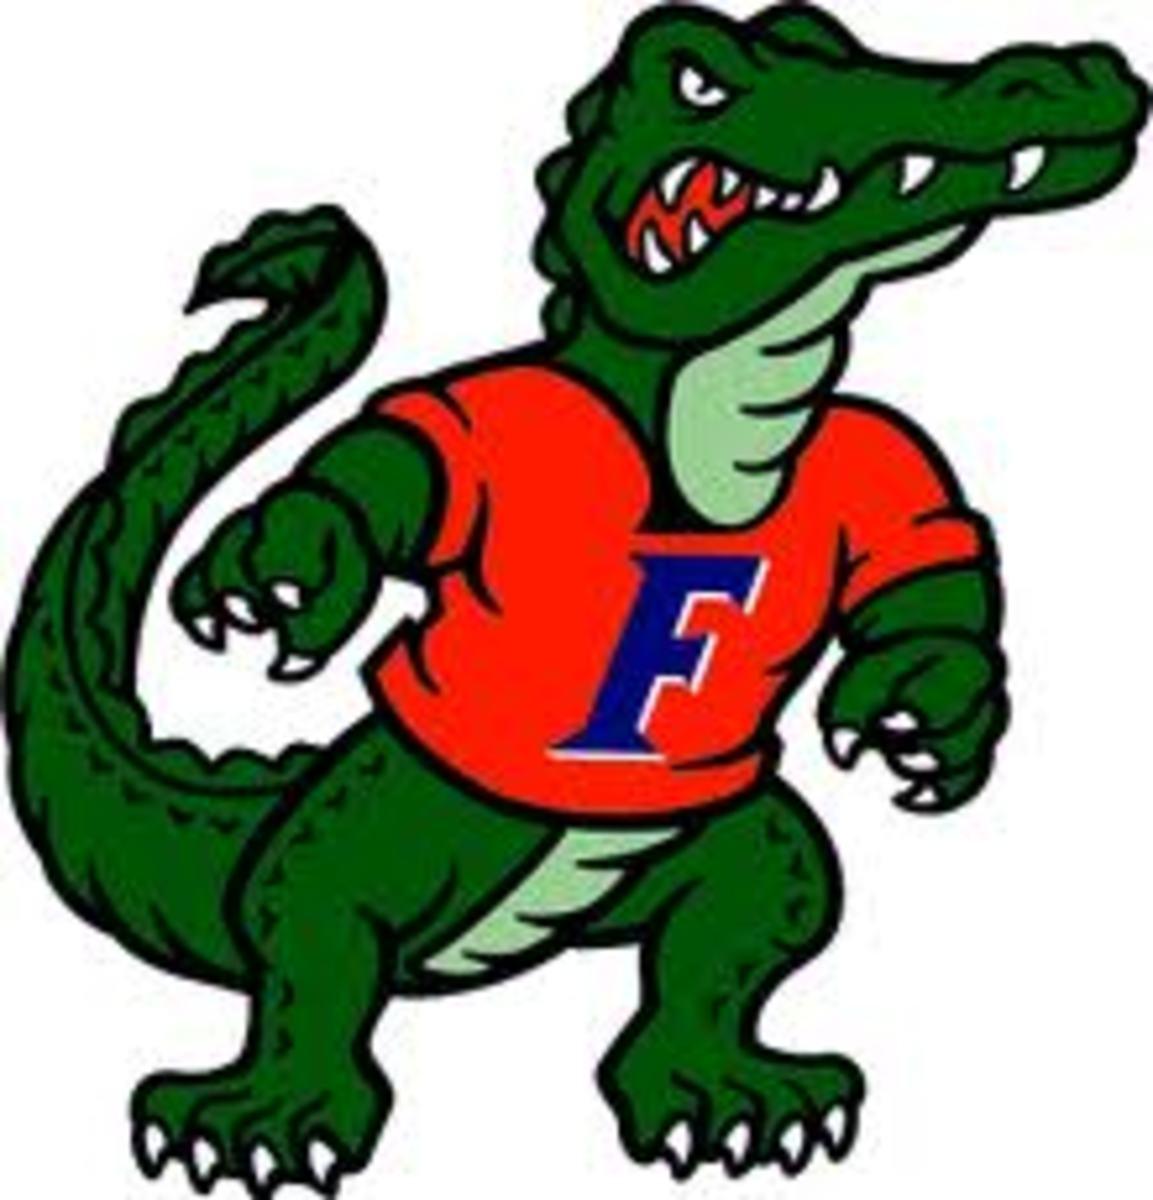 The other Gator - University of Florida